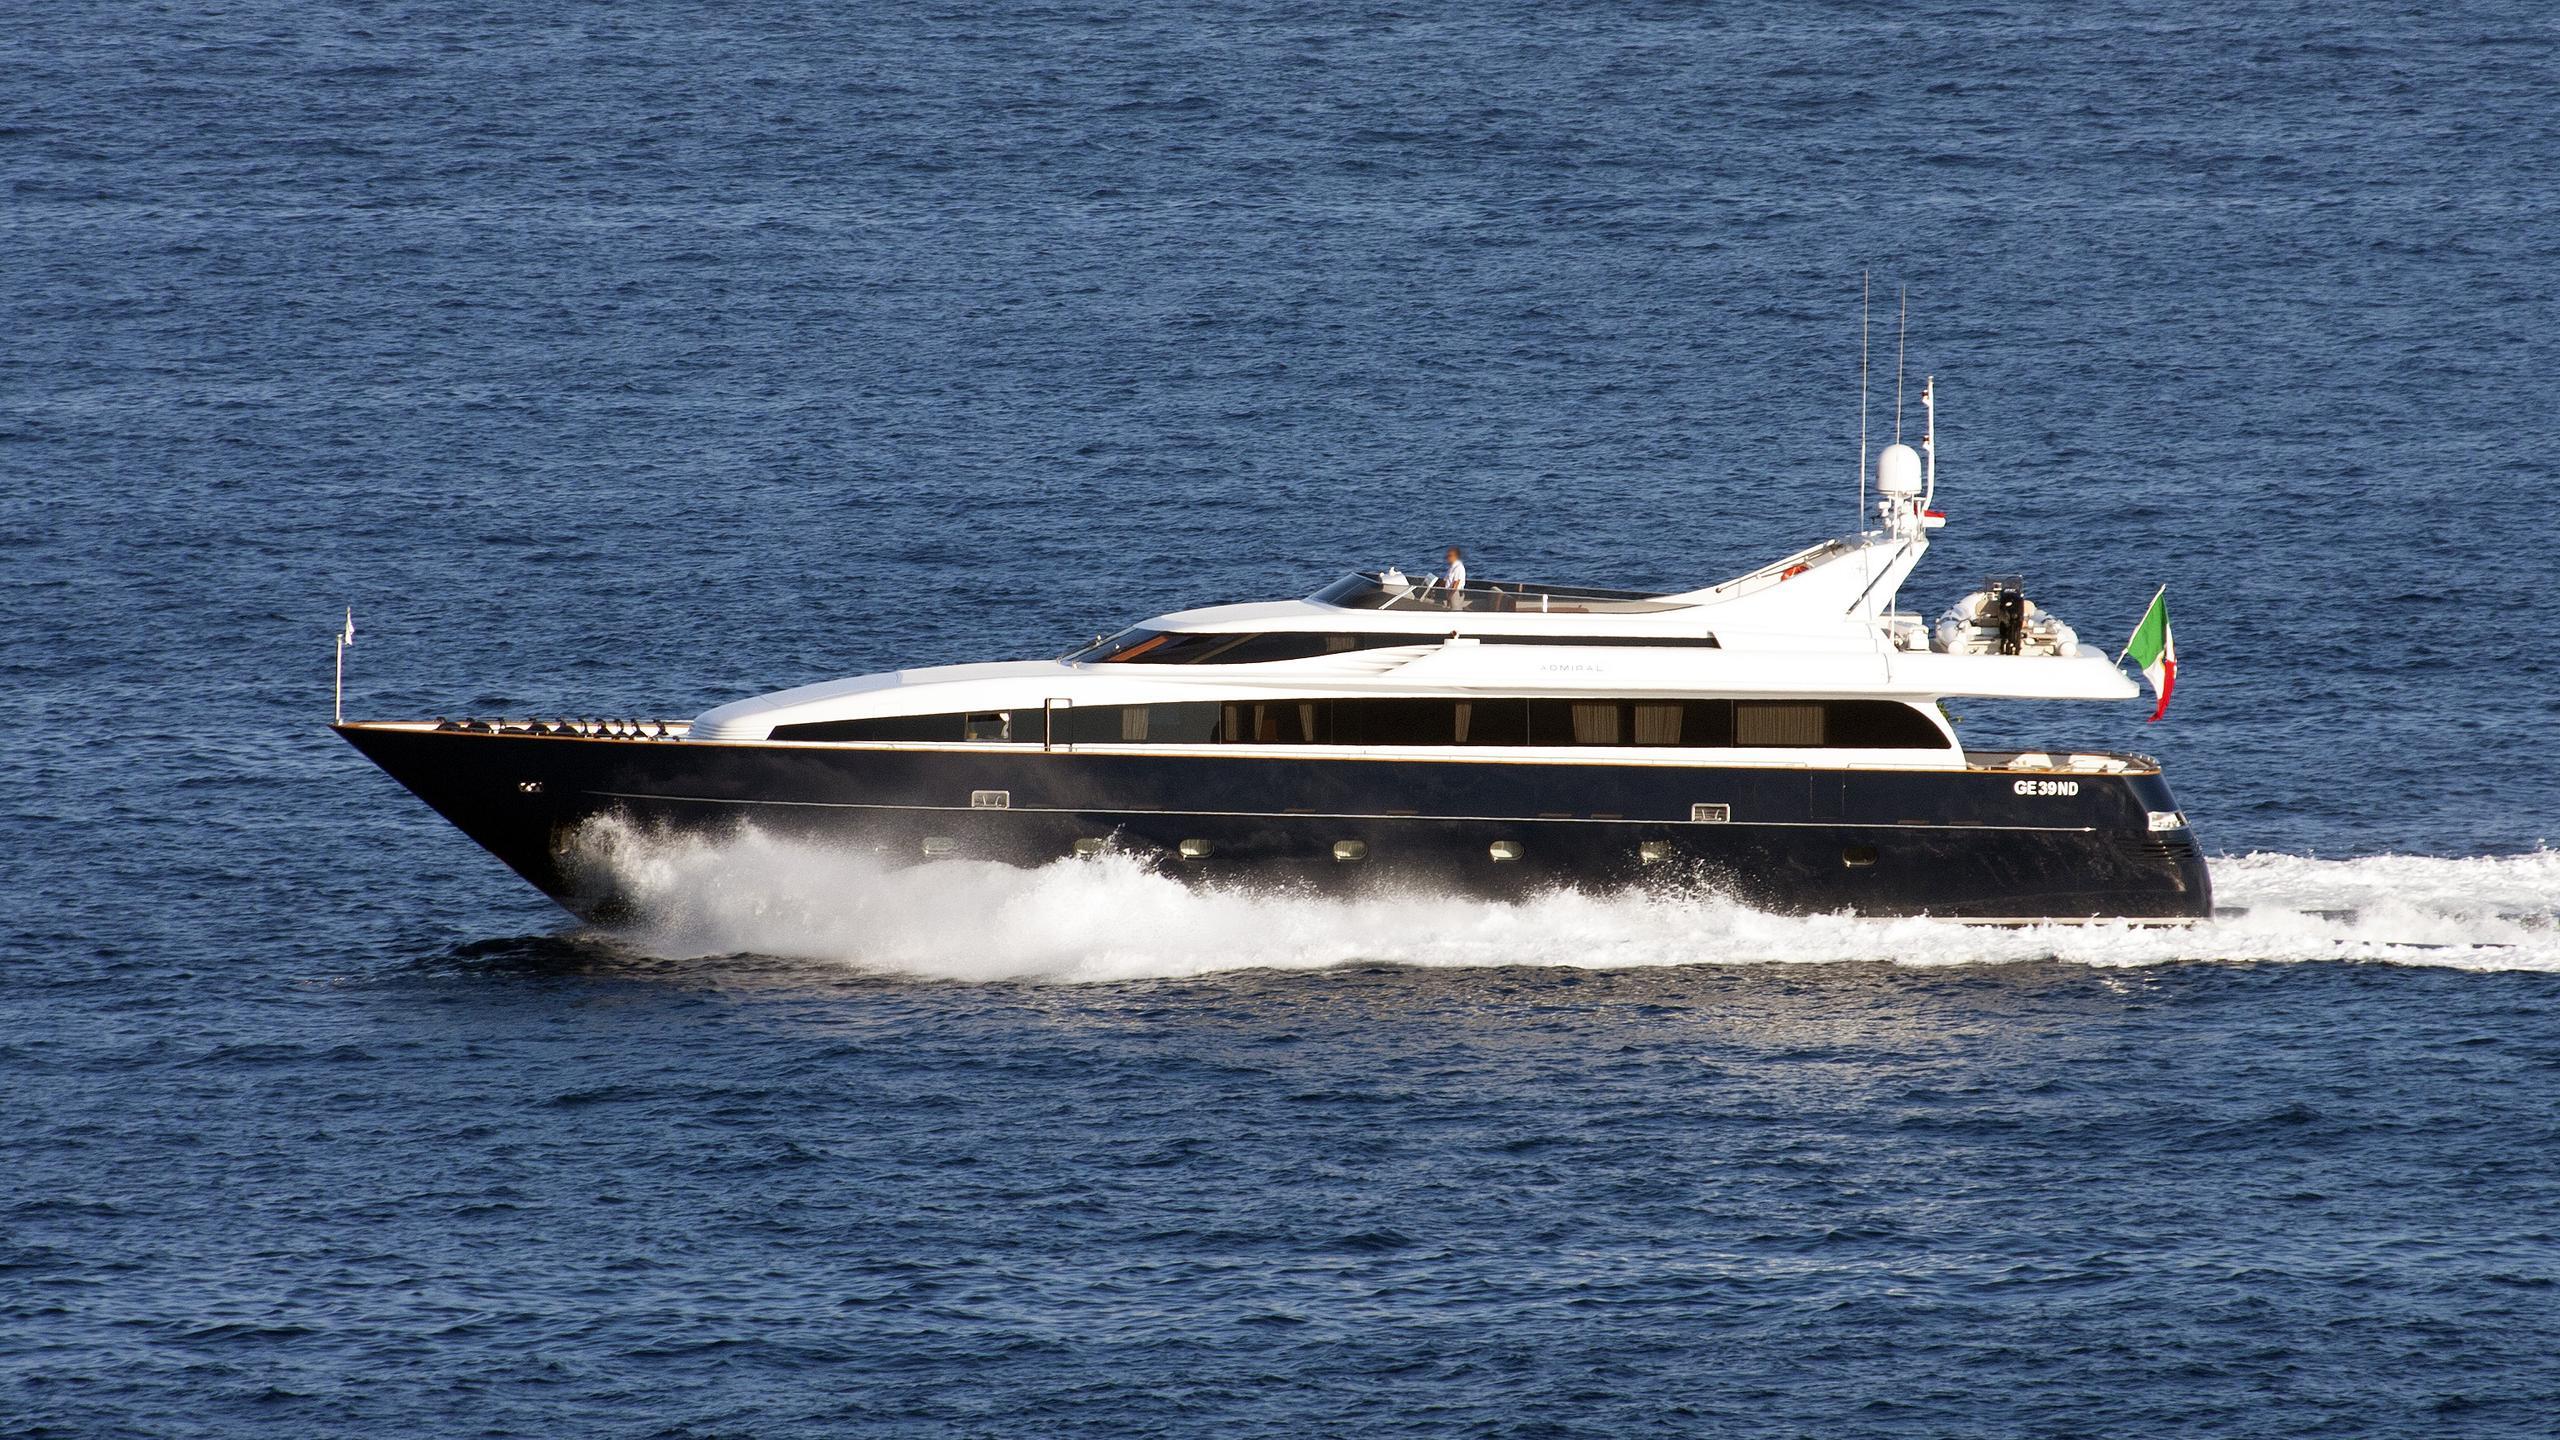 alhena-motor-yacht-admiral-italian-sea-group-33-2004-25m-cruising